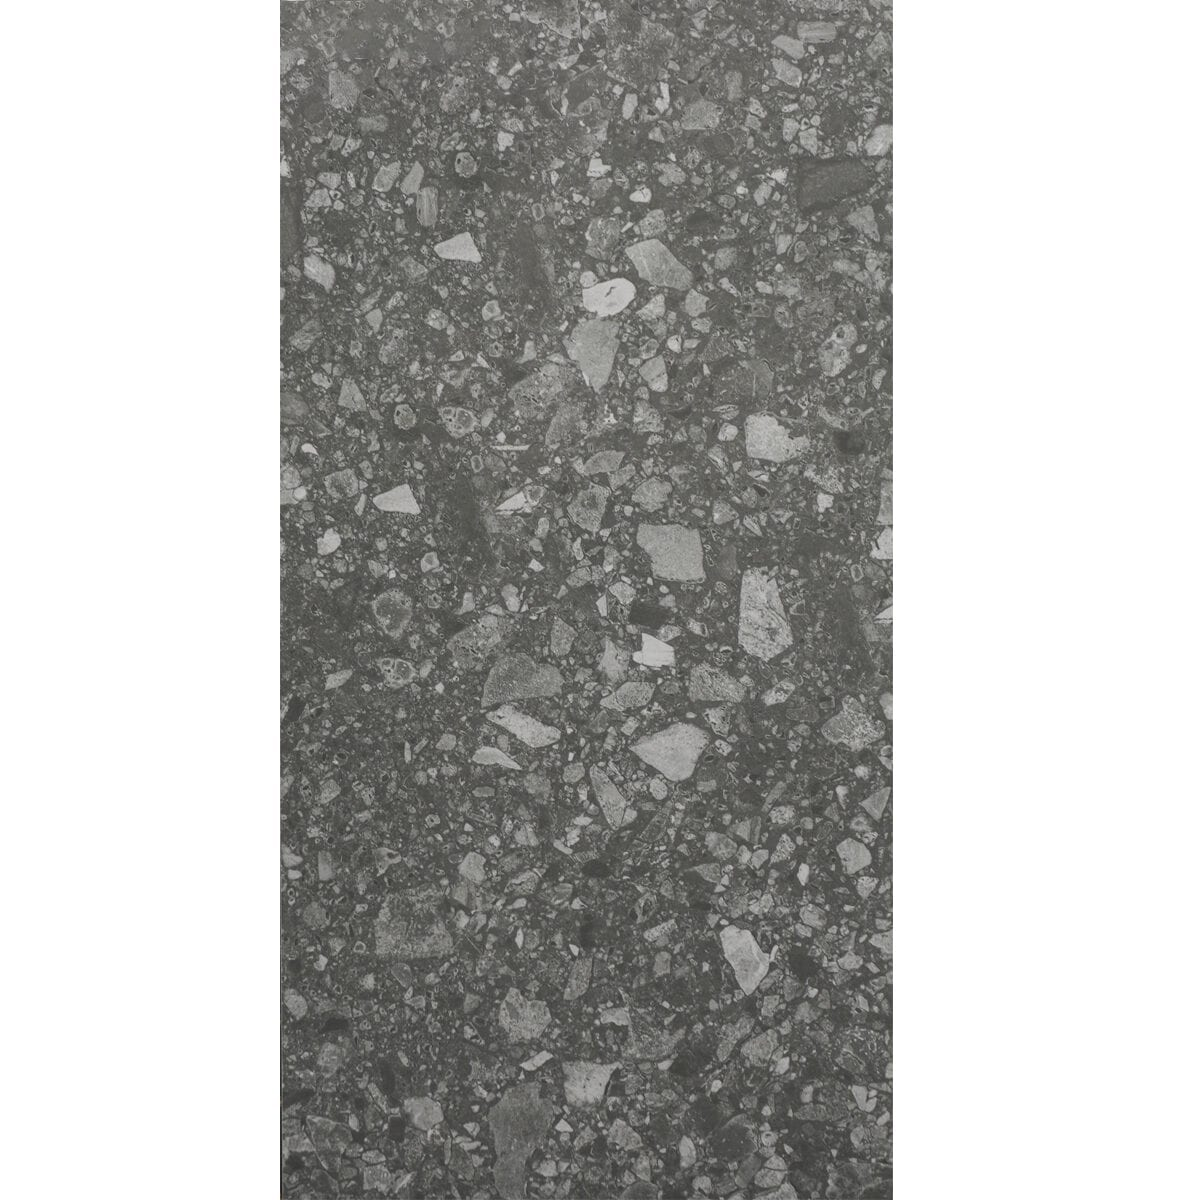 T10909 Starburst Dorian Grey Polished